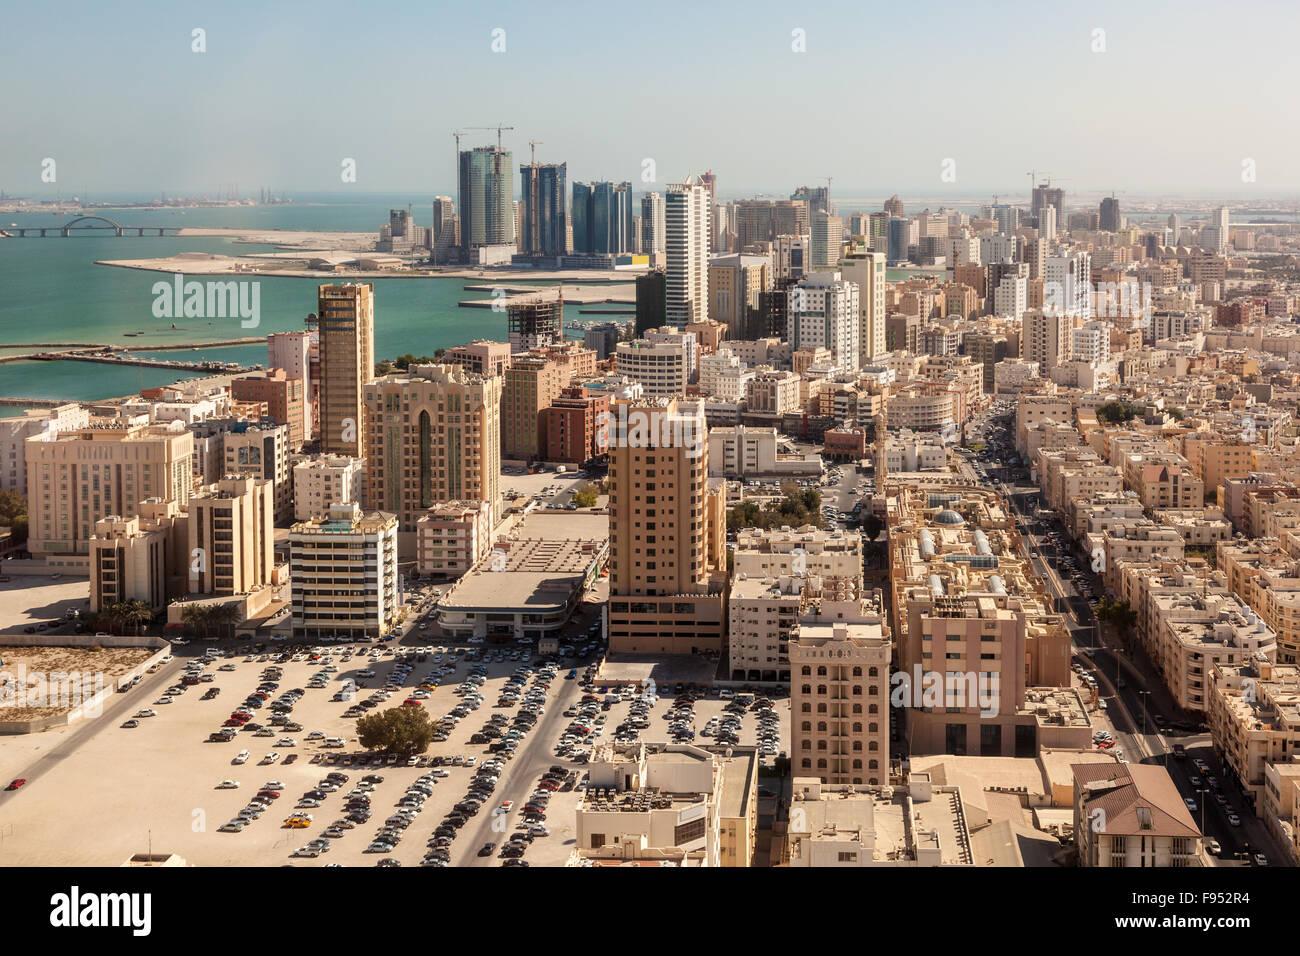 City of Manama, Bahrain - Stock Image